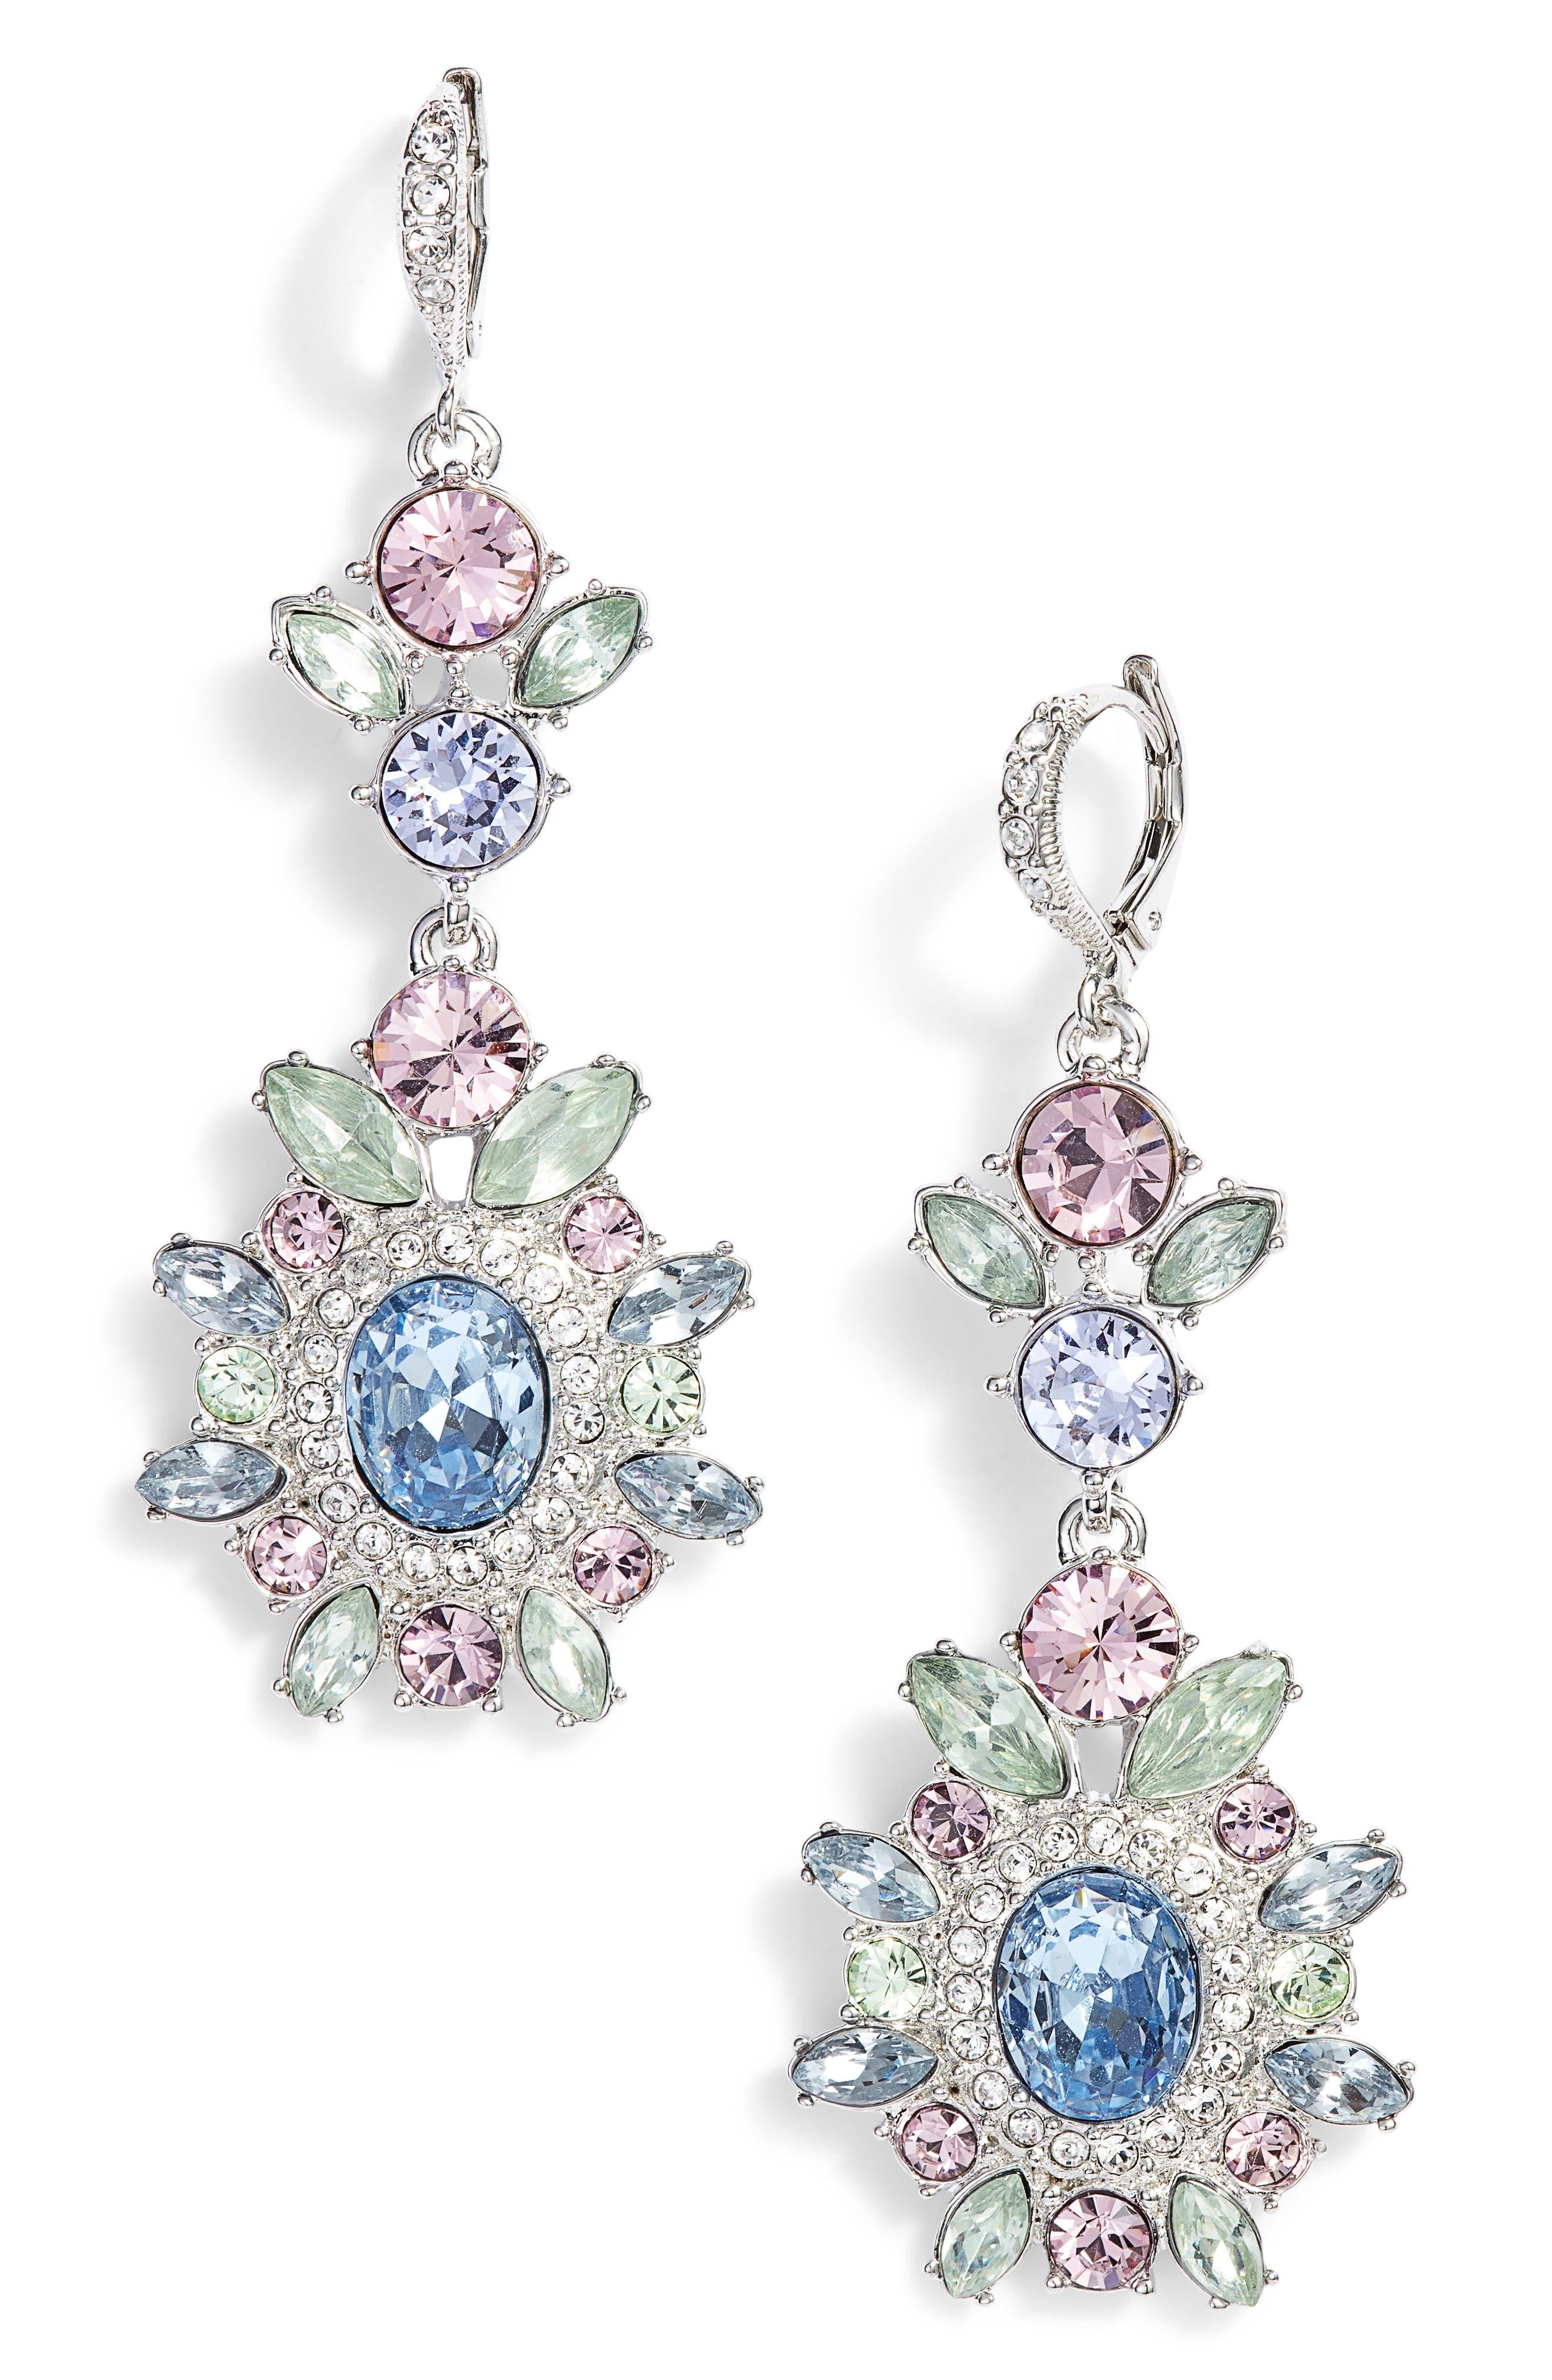 Large Double Drop Crystal Earrings,                             Main thumbnail 1, color,                             040